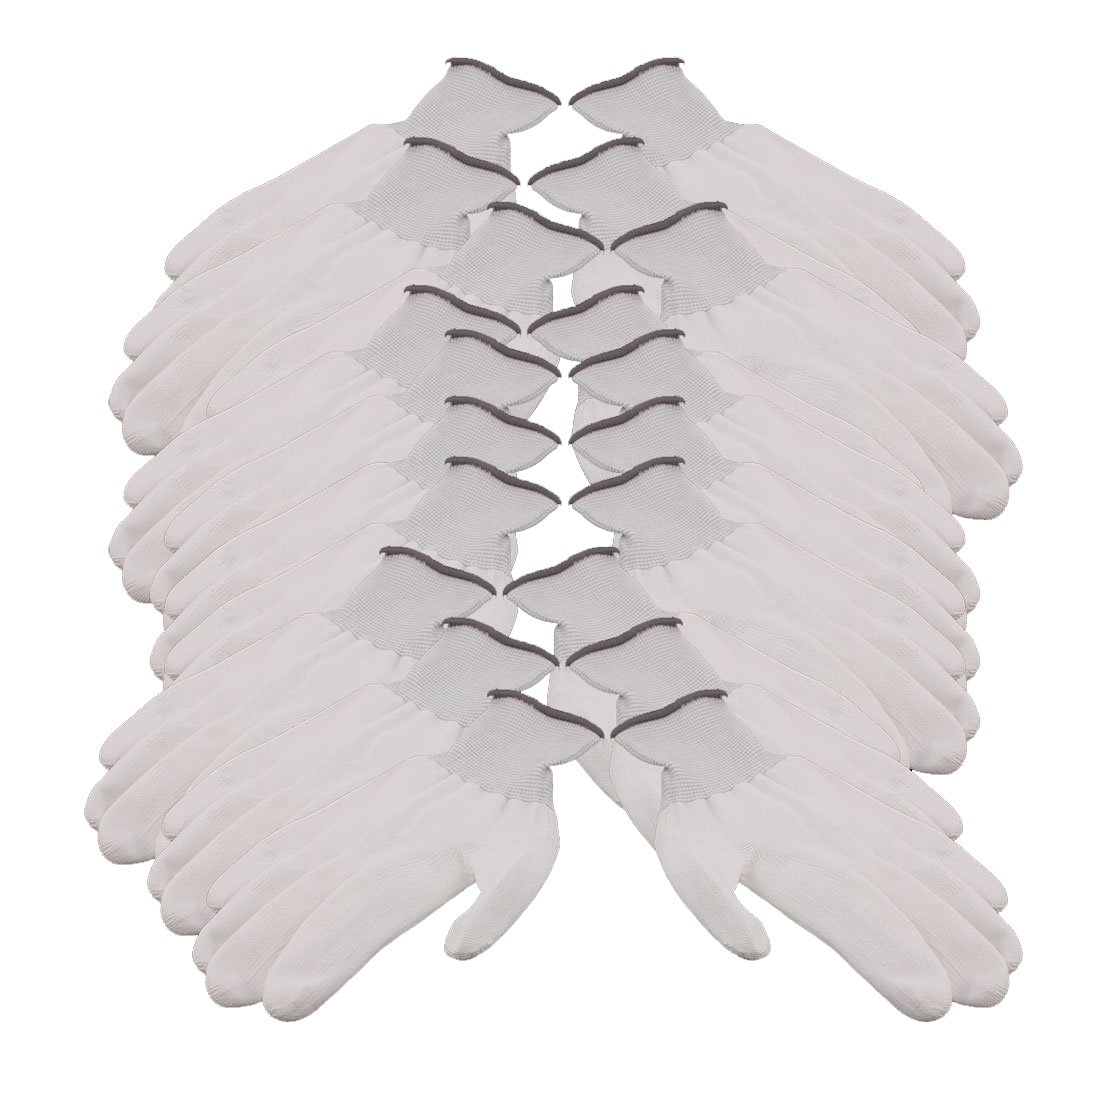 uxcell 10 Pair 13 Needles Nylon Labor Protection Anti-static Non-slip Gloves Gray White